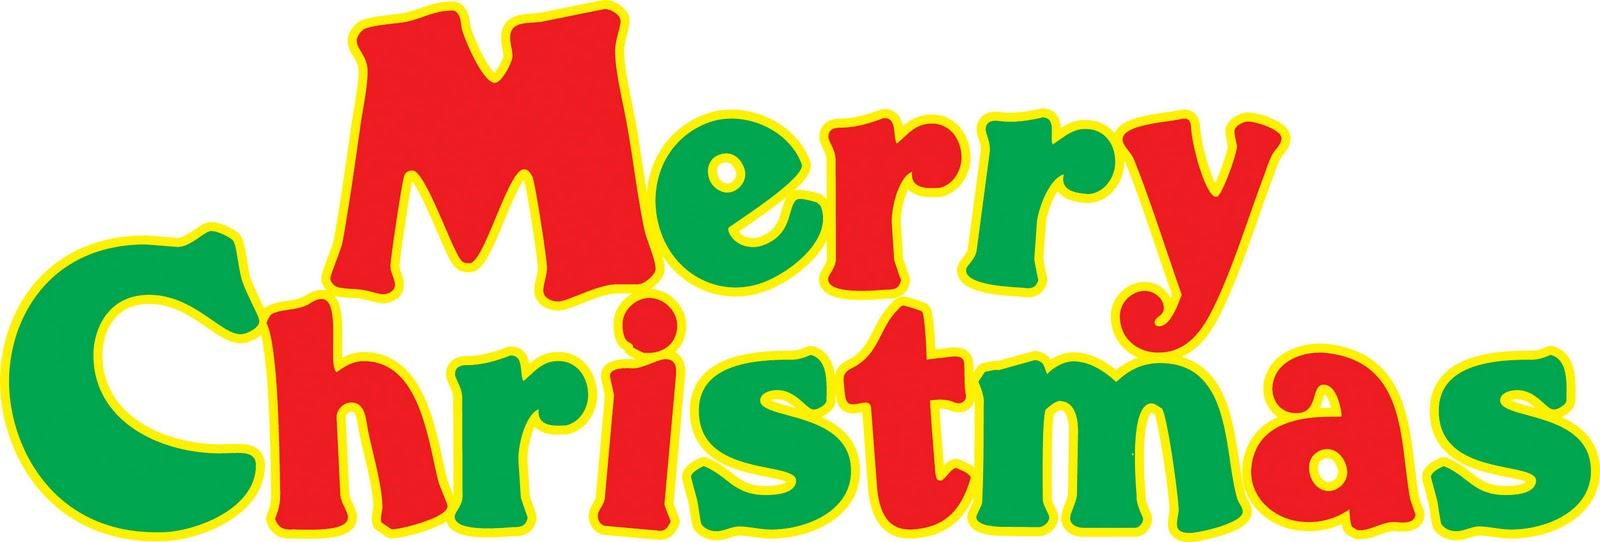 Merry Christmas Banner Clipart-merry christmas banner clipart-7